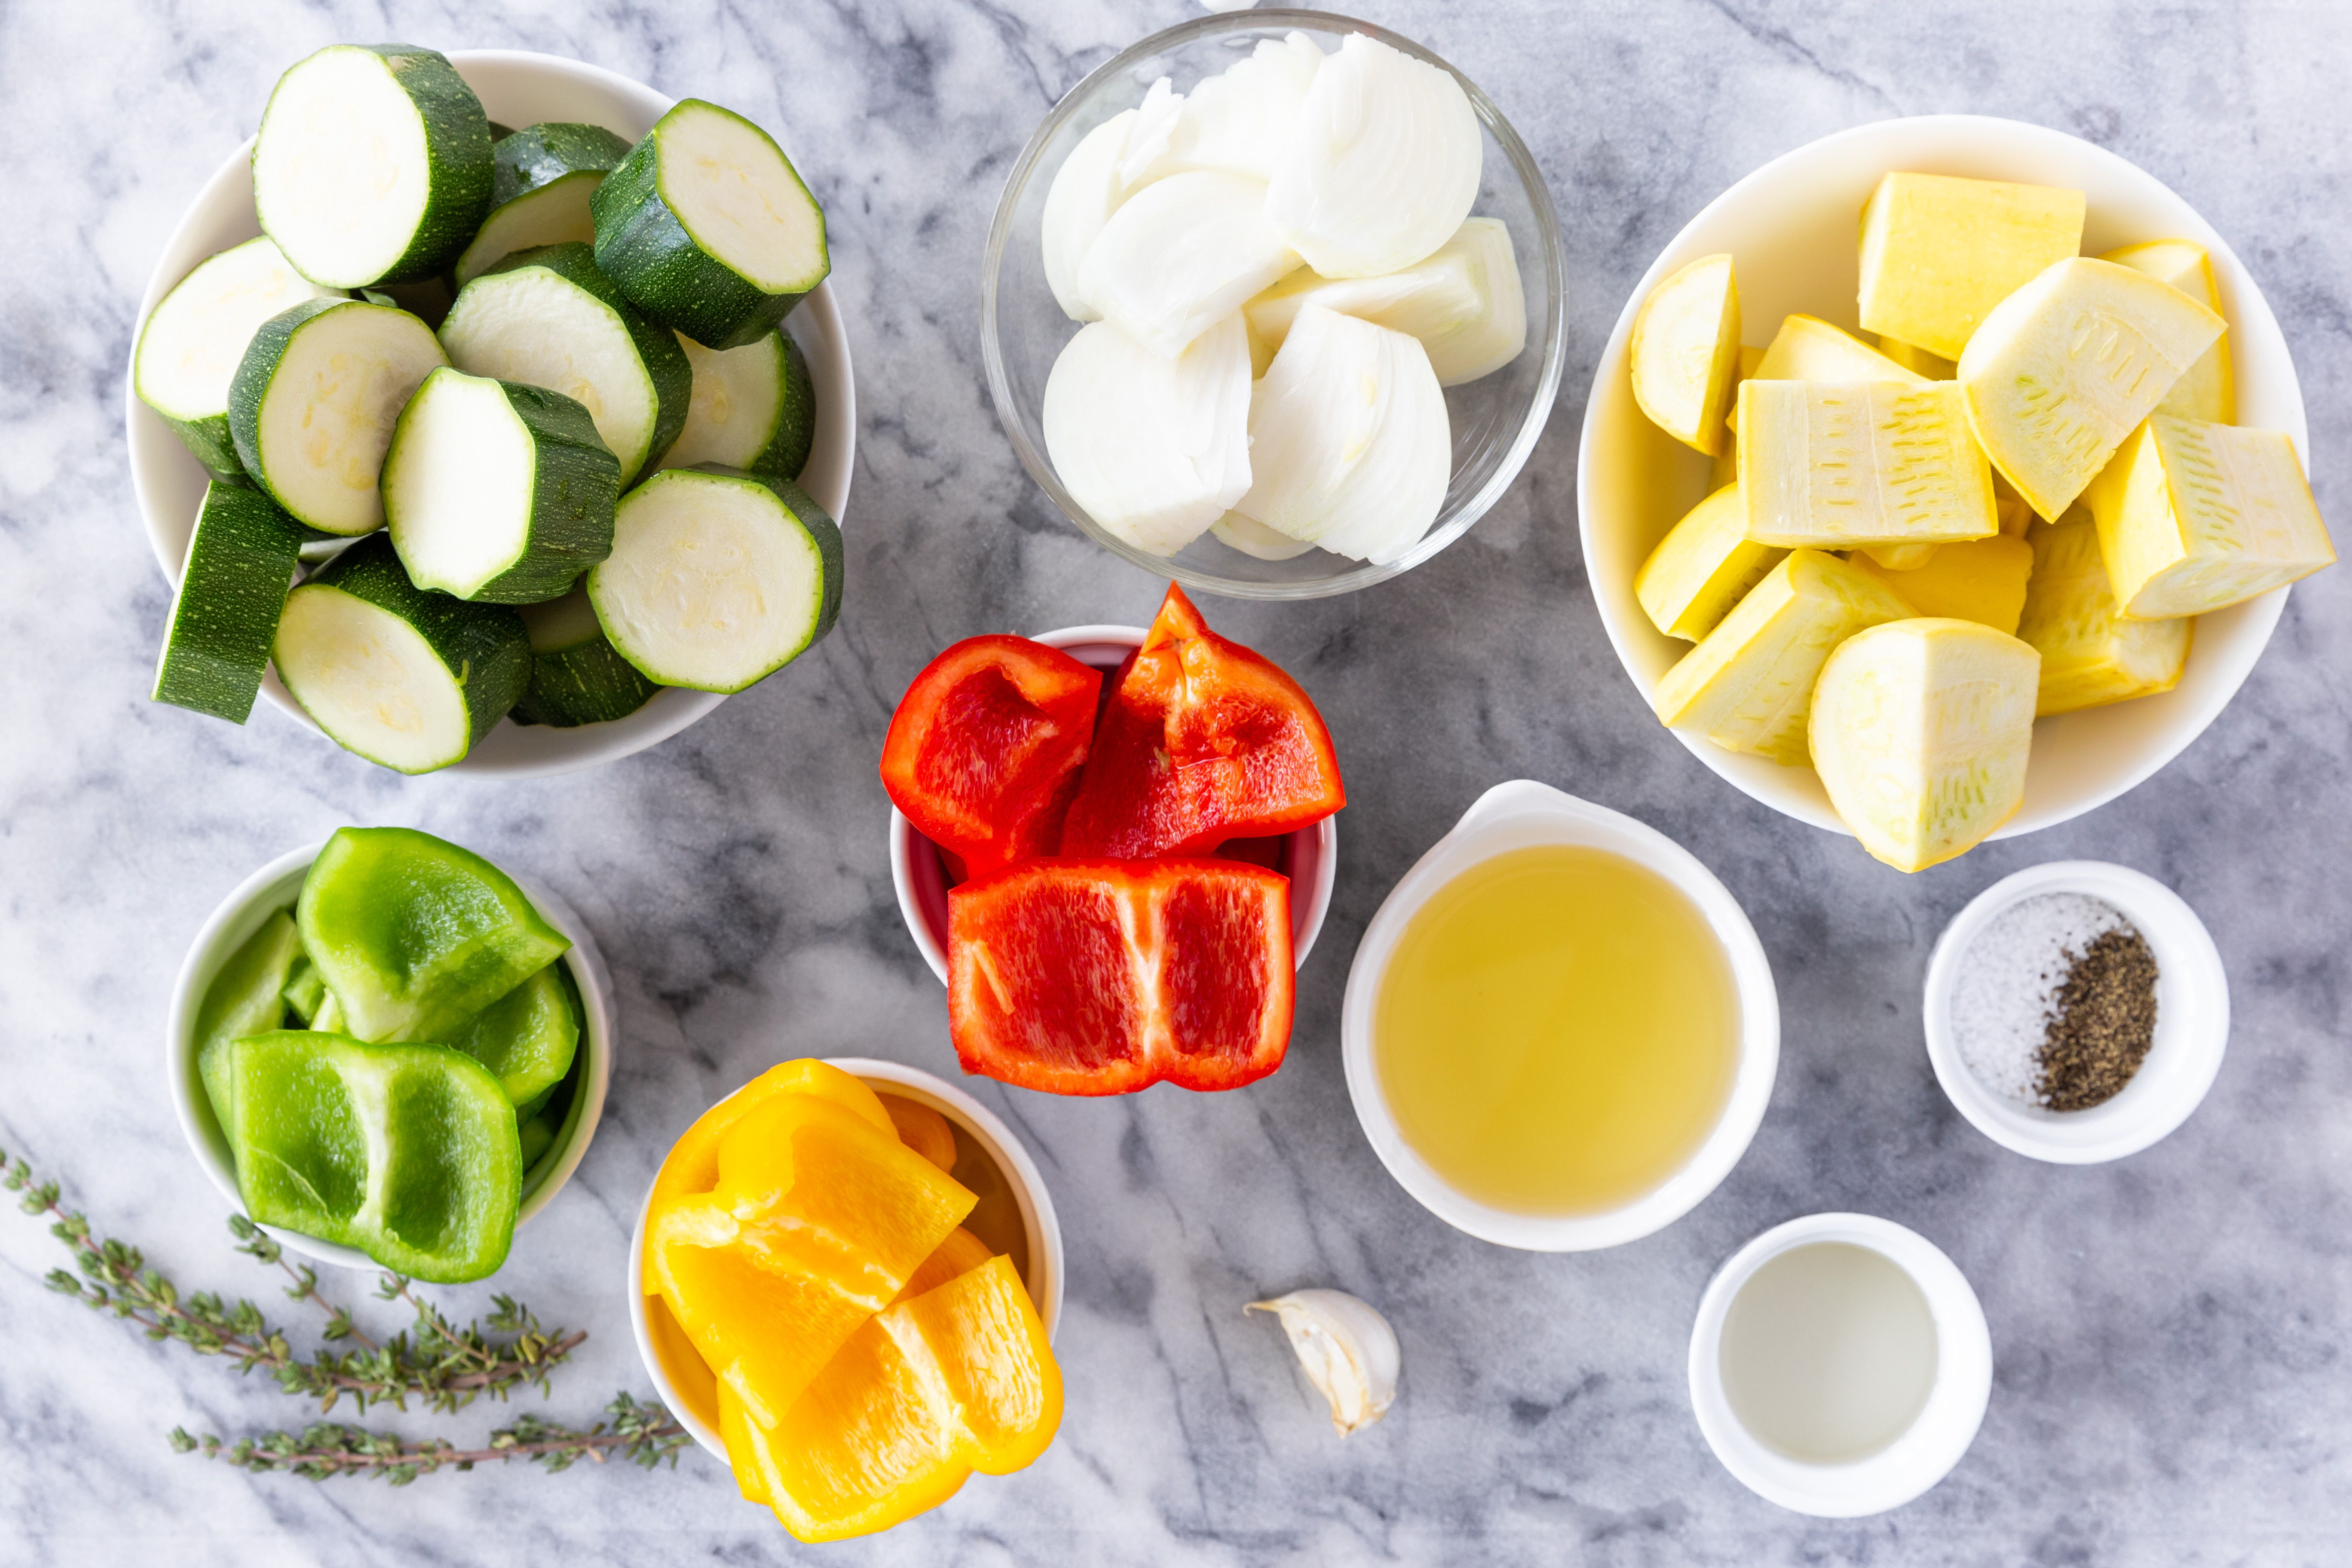 Ingredients for roasted peppers and seasonal vegetables